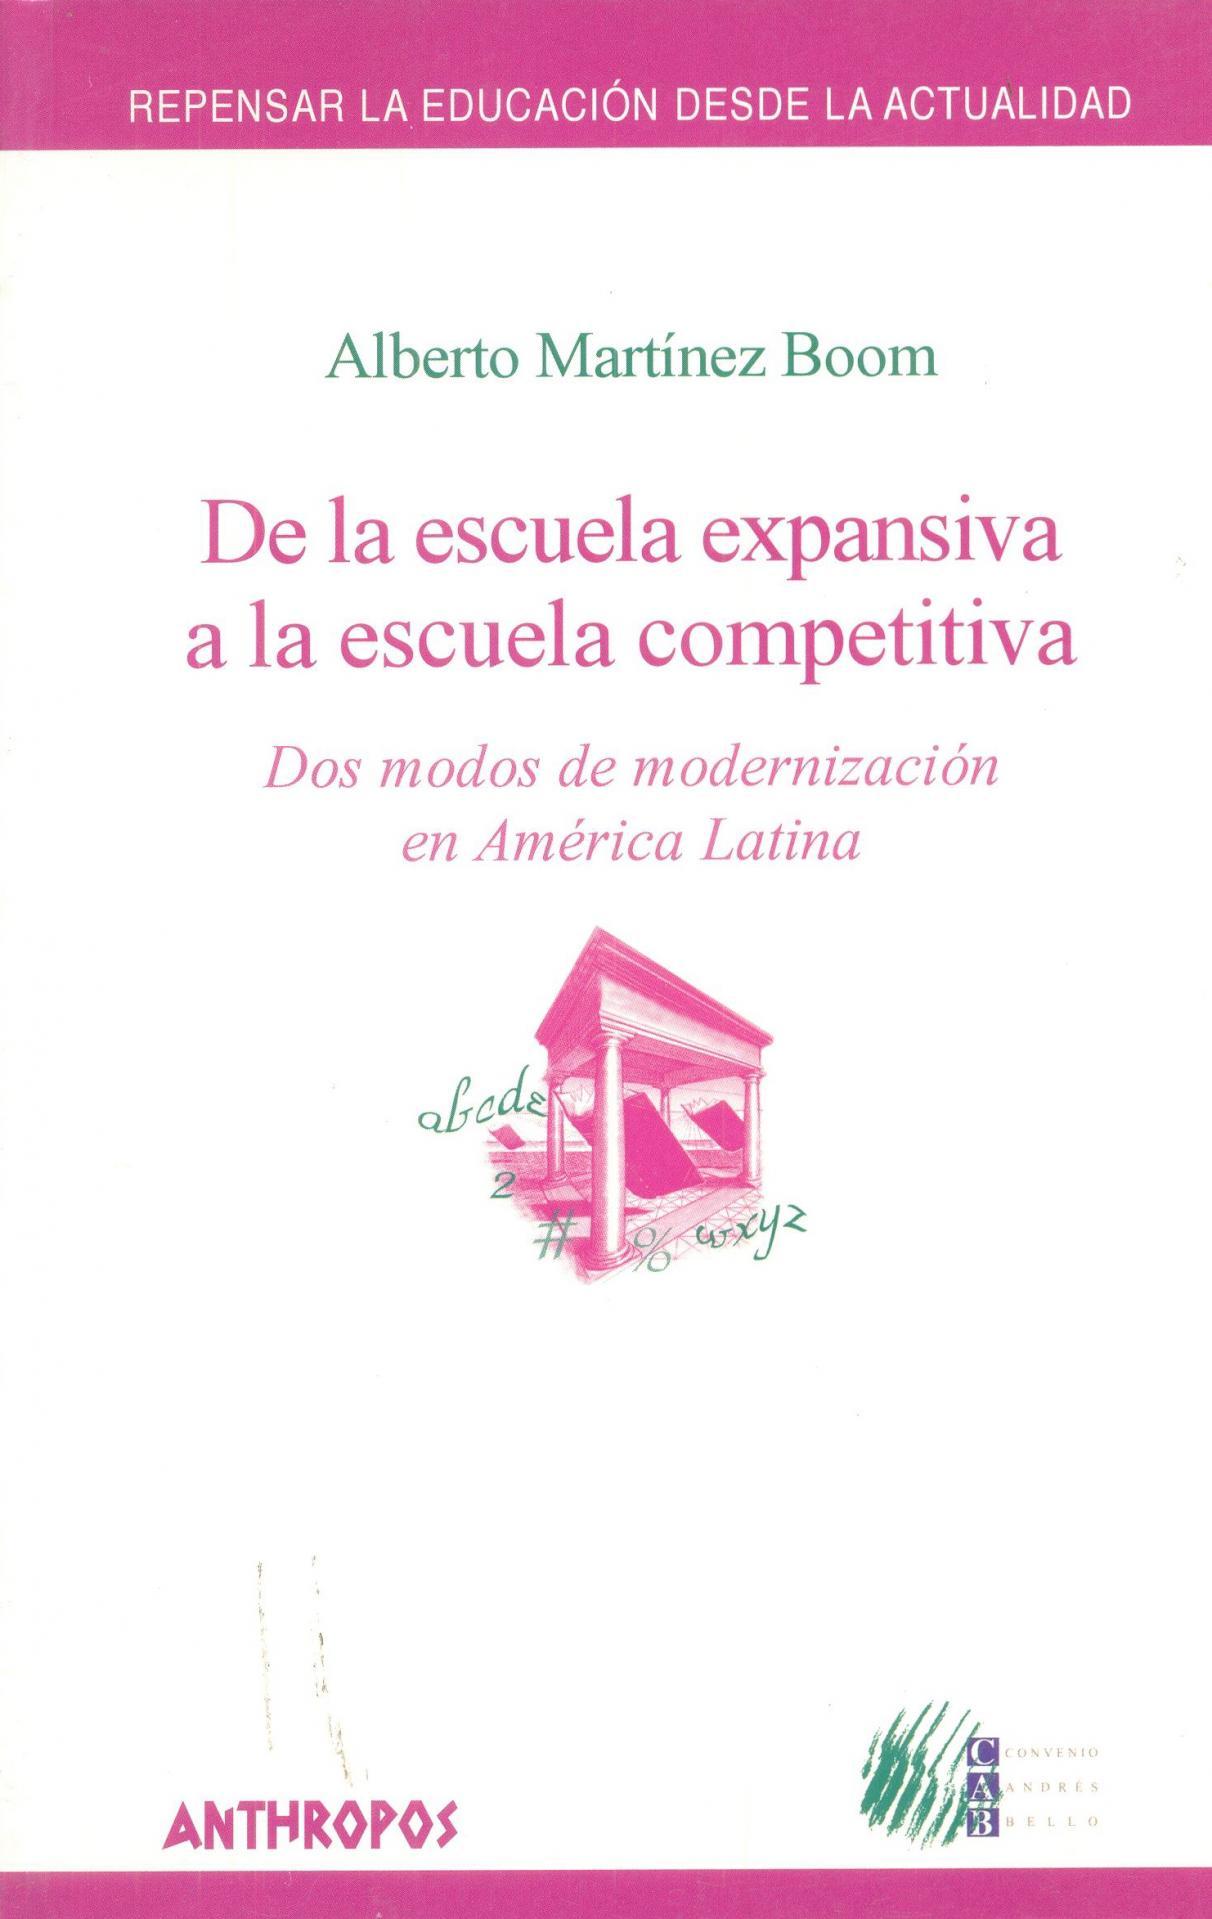 DE LA ESCUELA EXPANSIVA A LA ESCUELA COMPETITIVA. Dos modos de modernización en América Latina. Martínez, A.